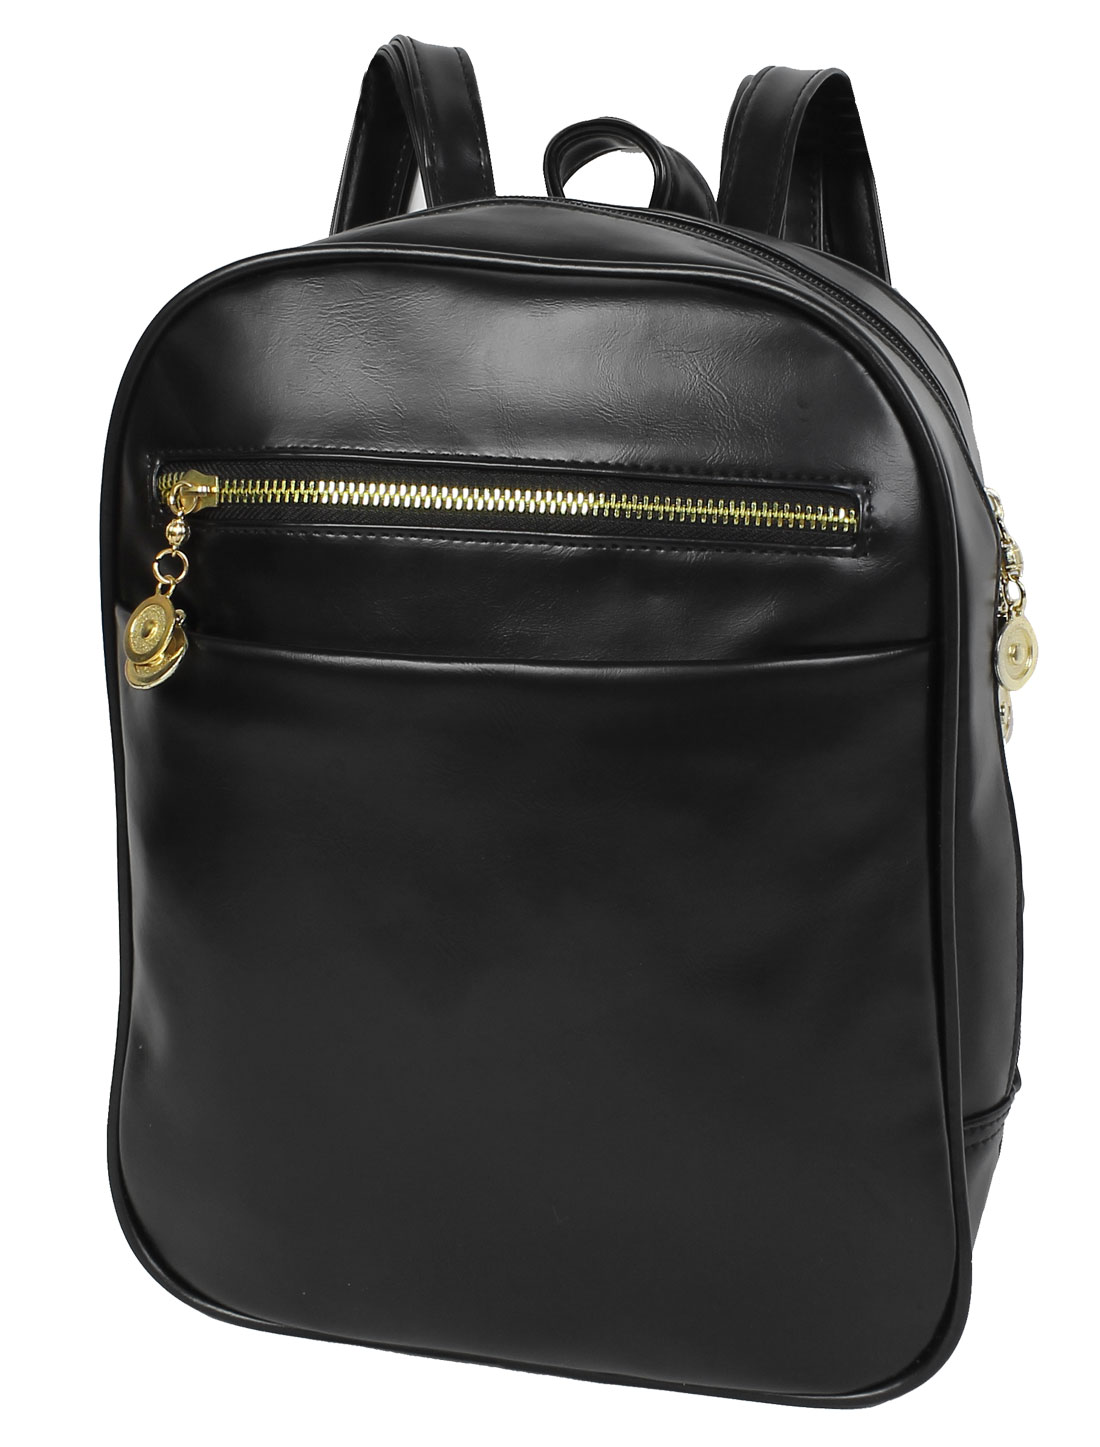 Women Fashion Zipper Closure Faux Leather School Bookbag Tote Backpack Black